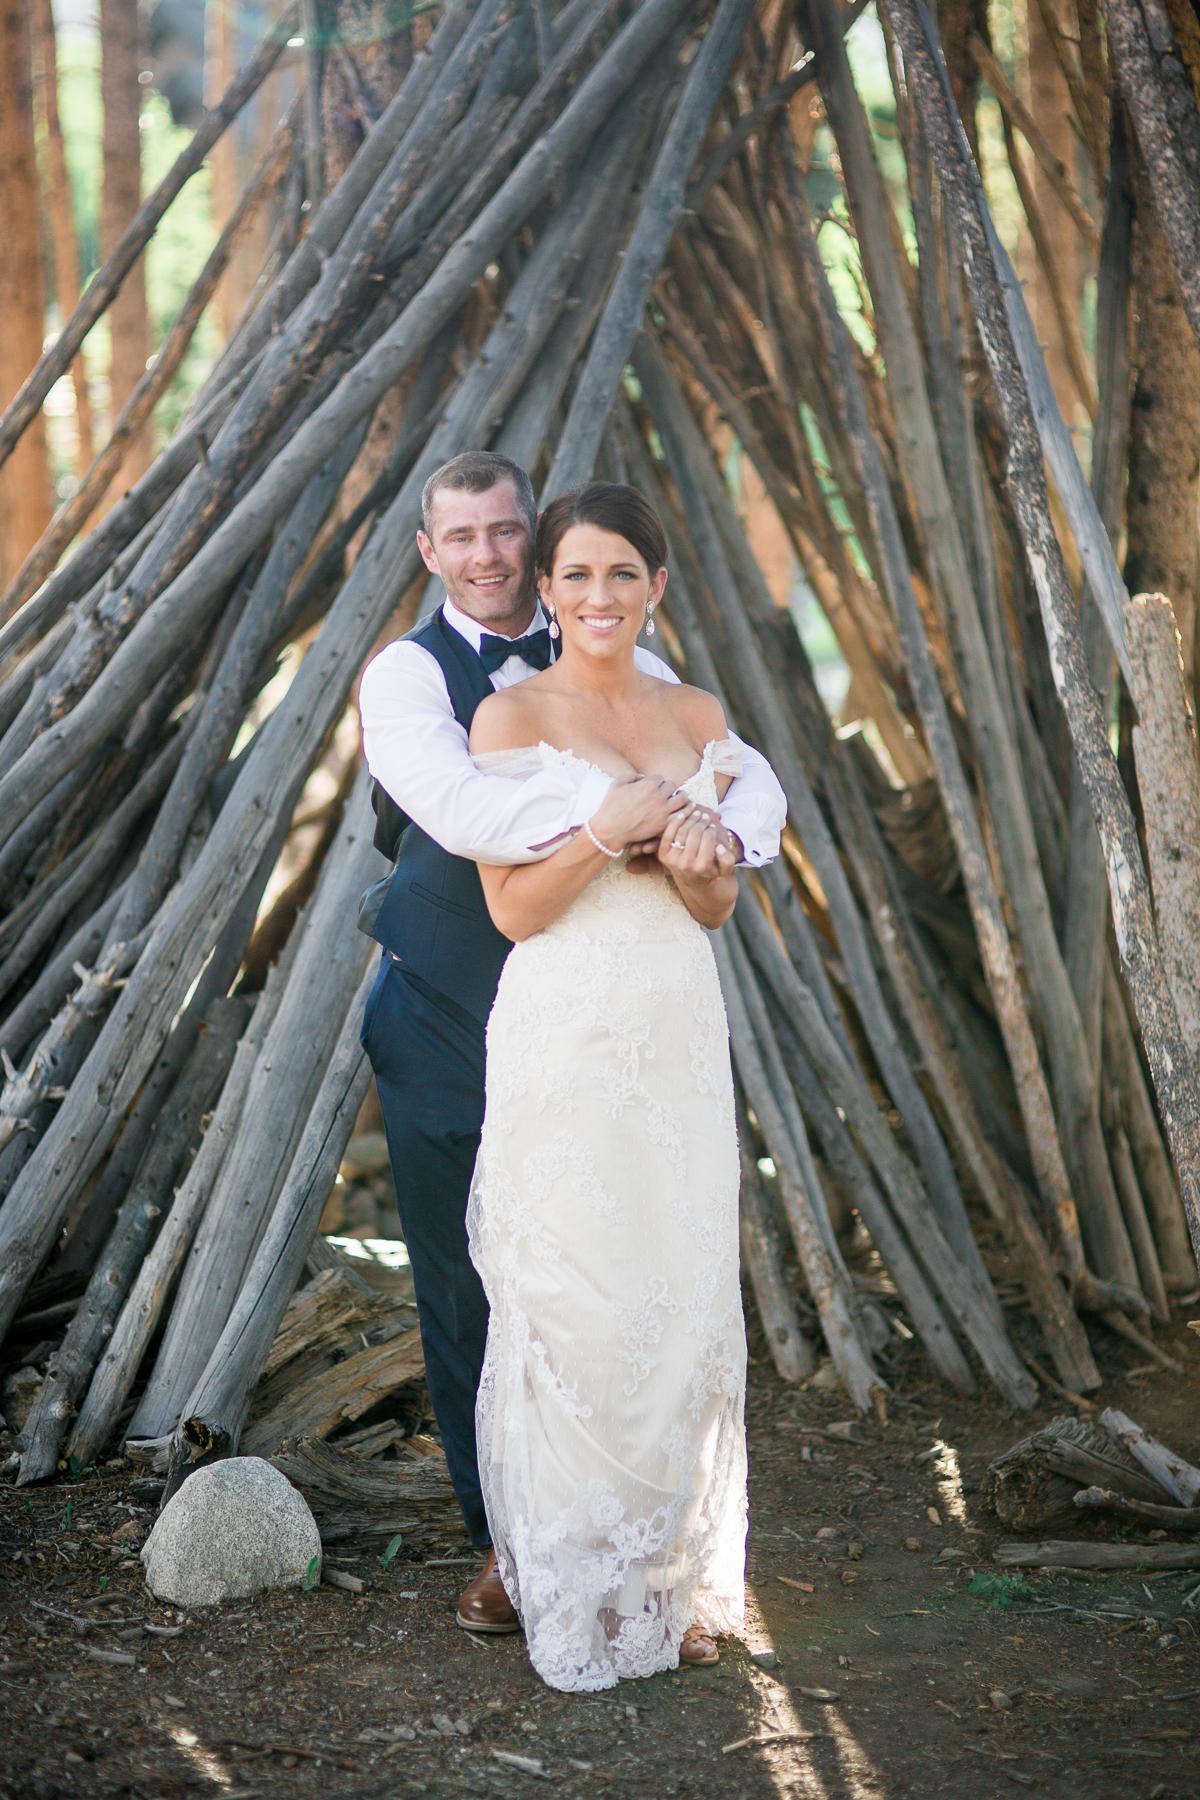 StaciDesign-Colorado-Wedding-5427.jpg